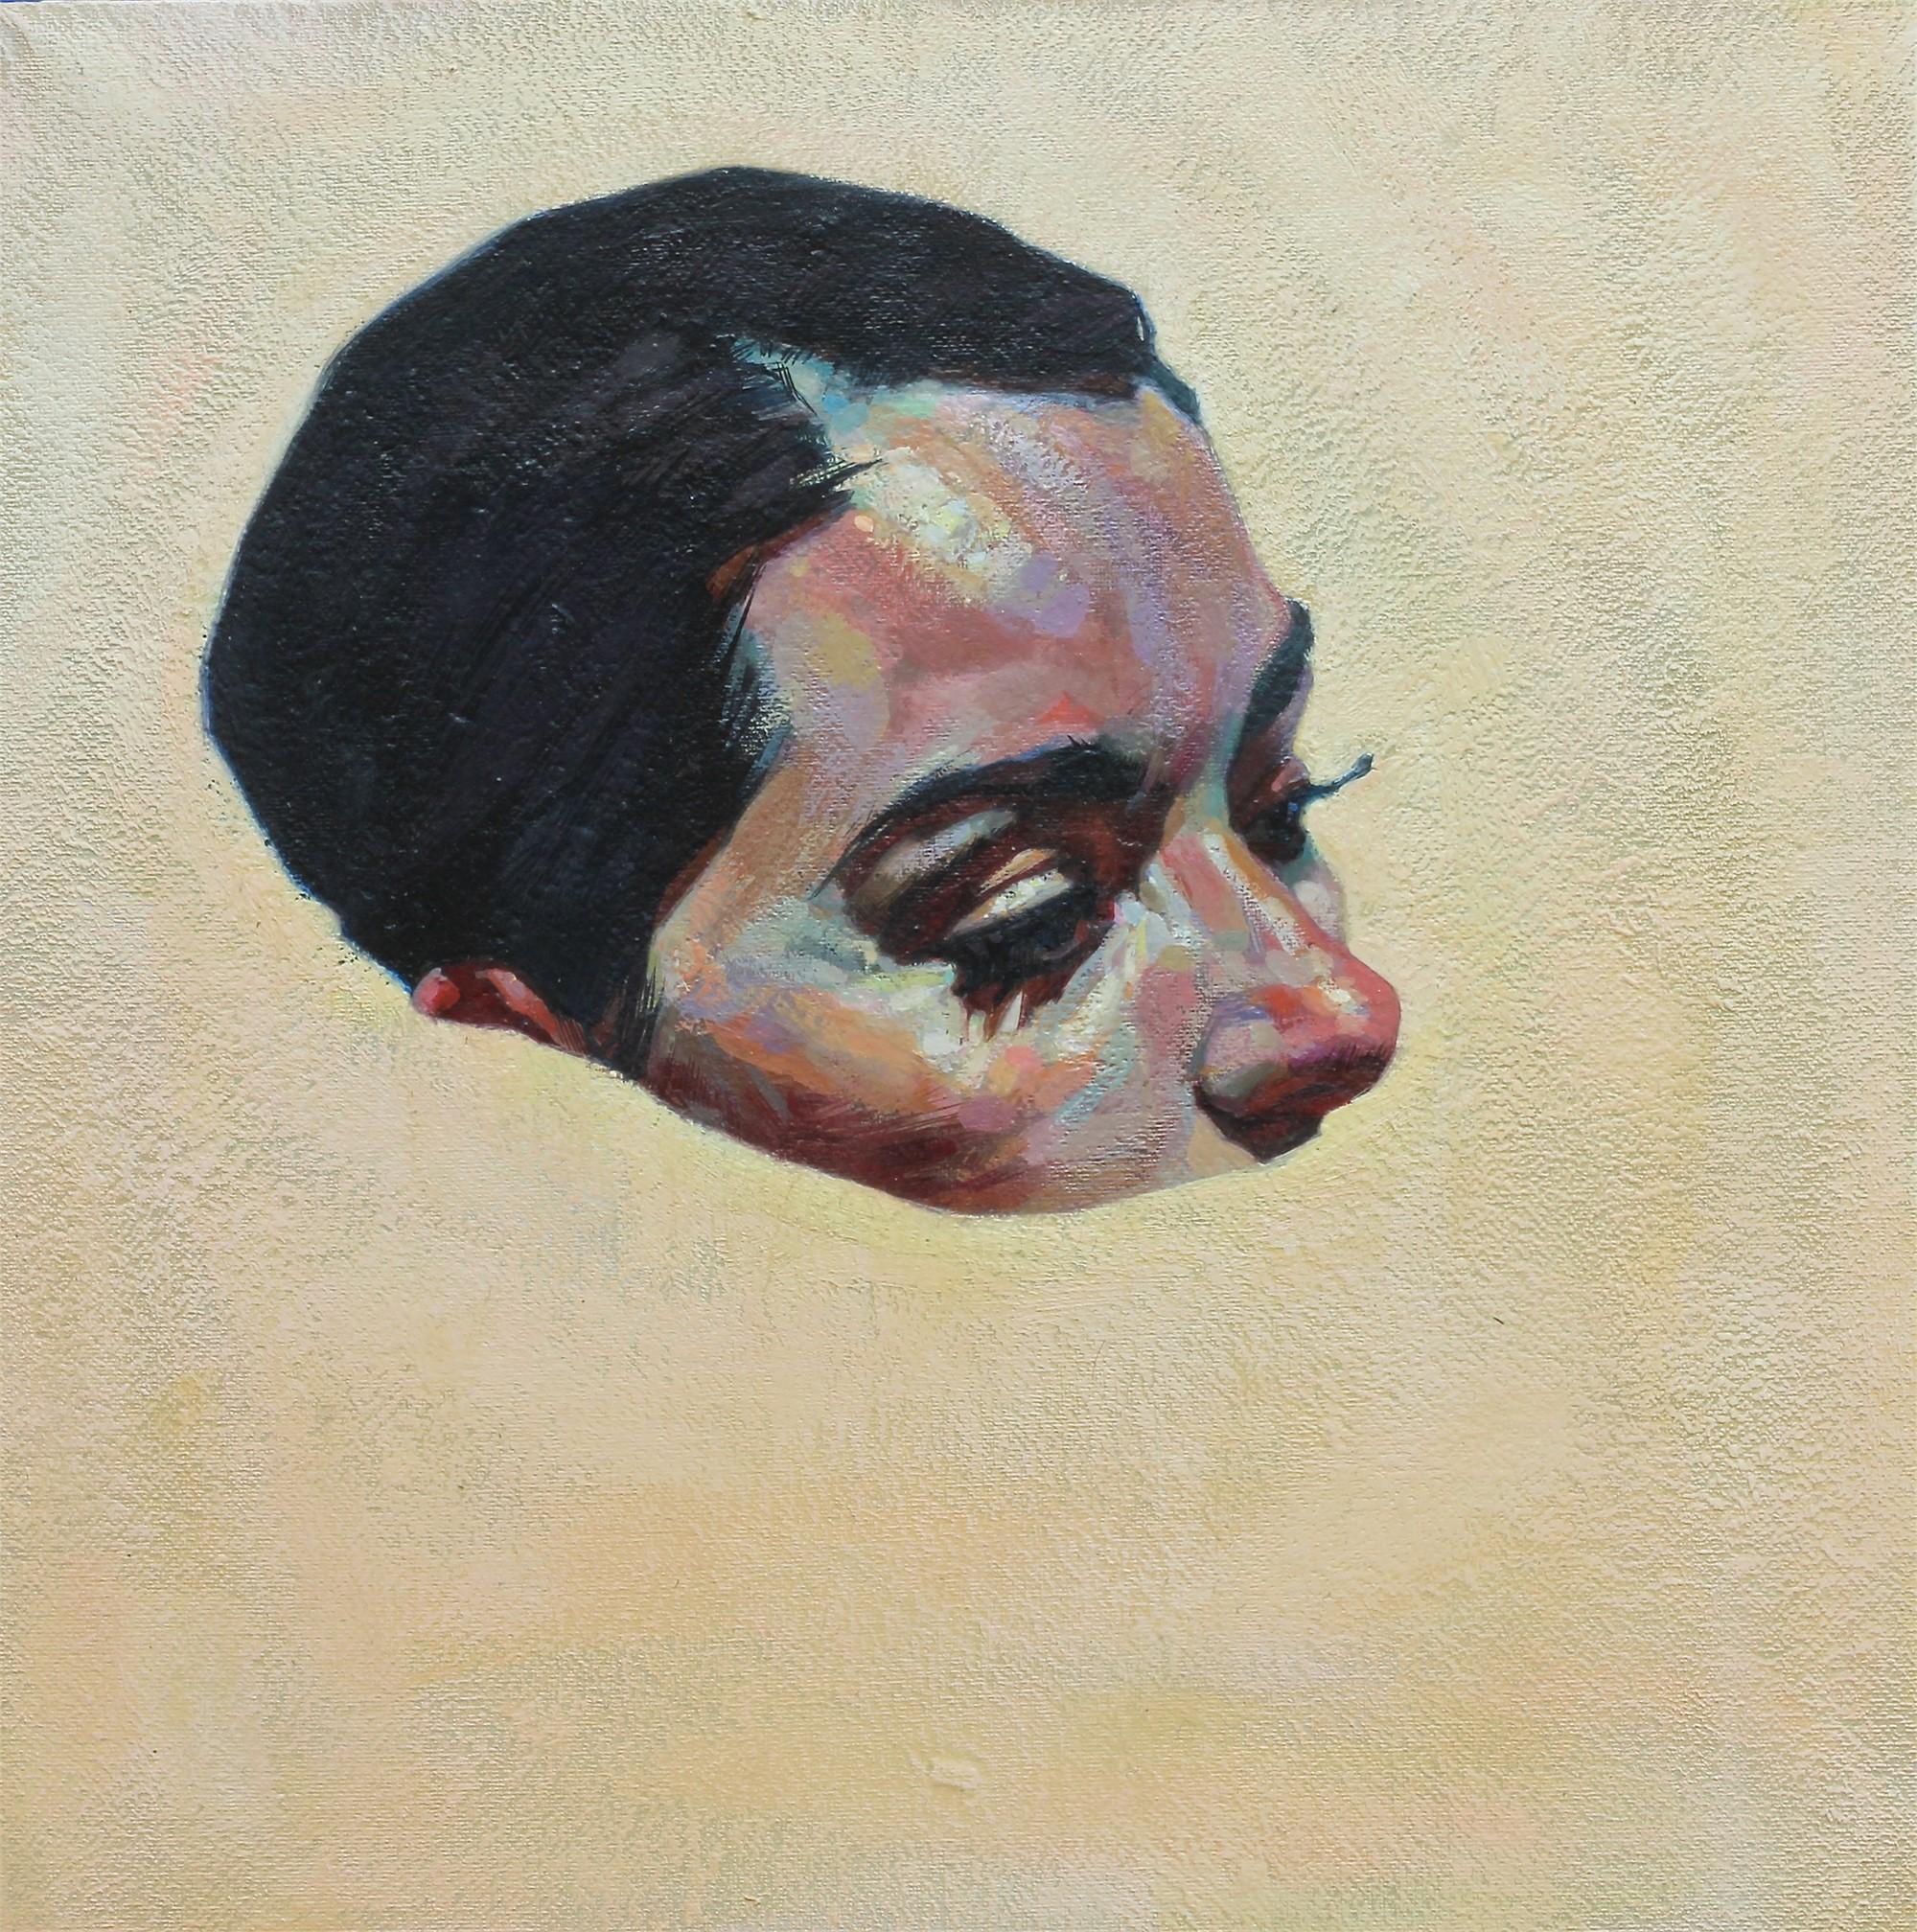 Emergence by Timur Akhriev